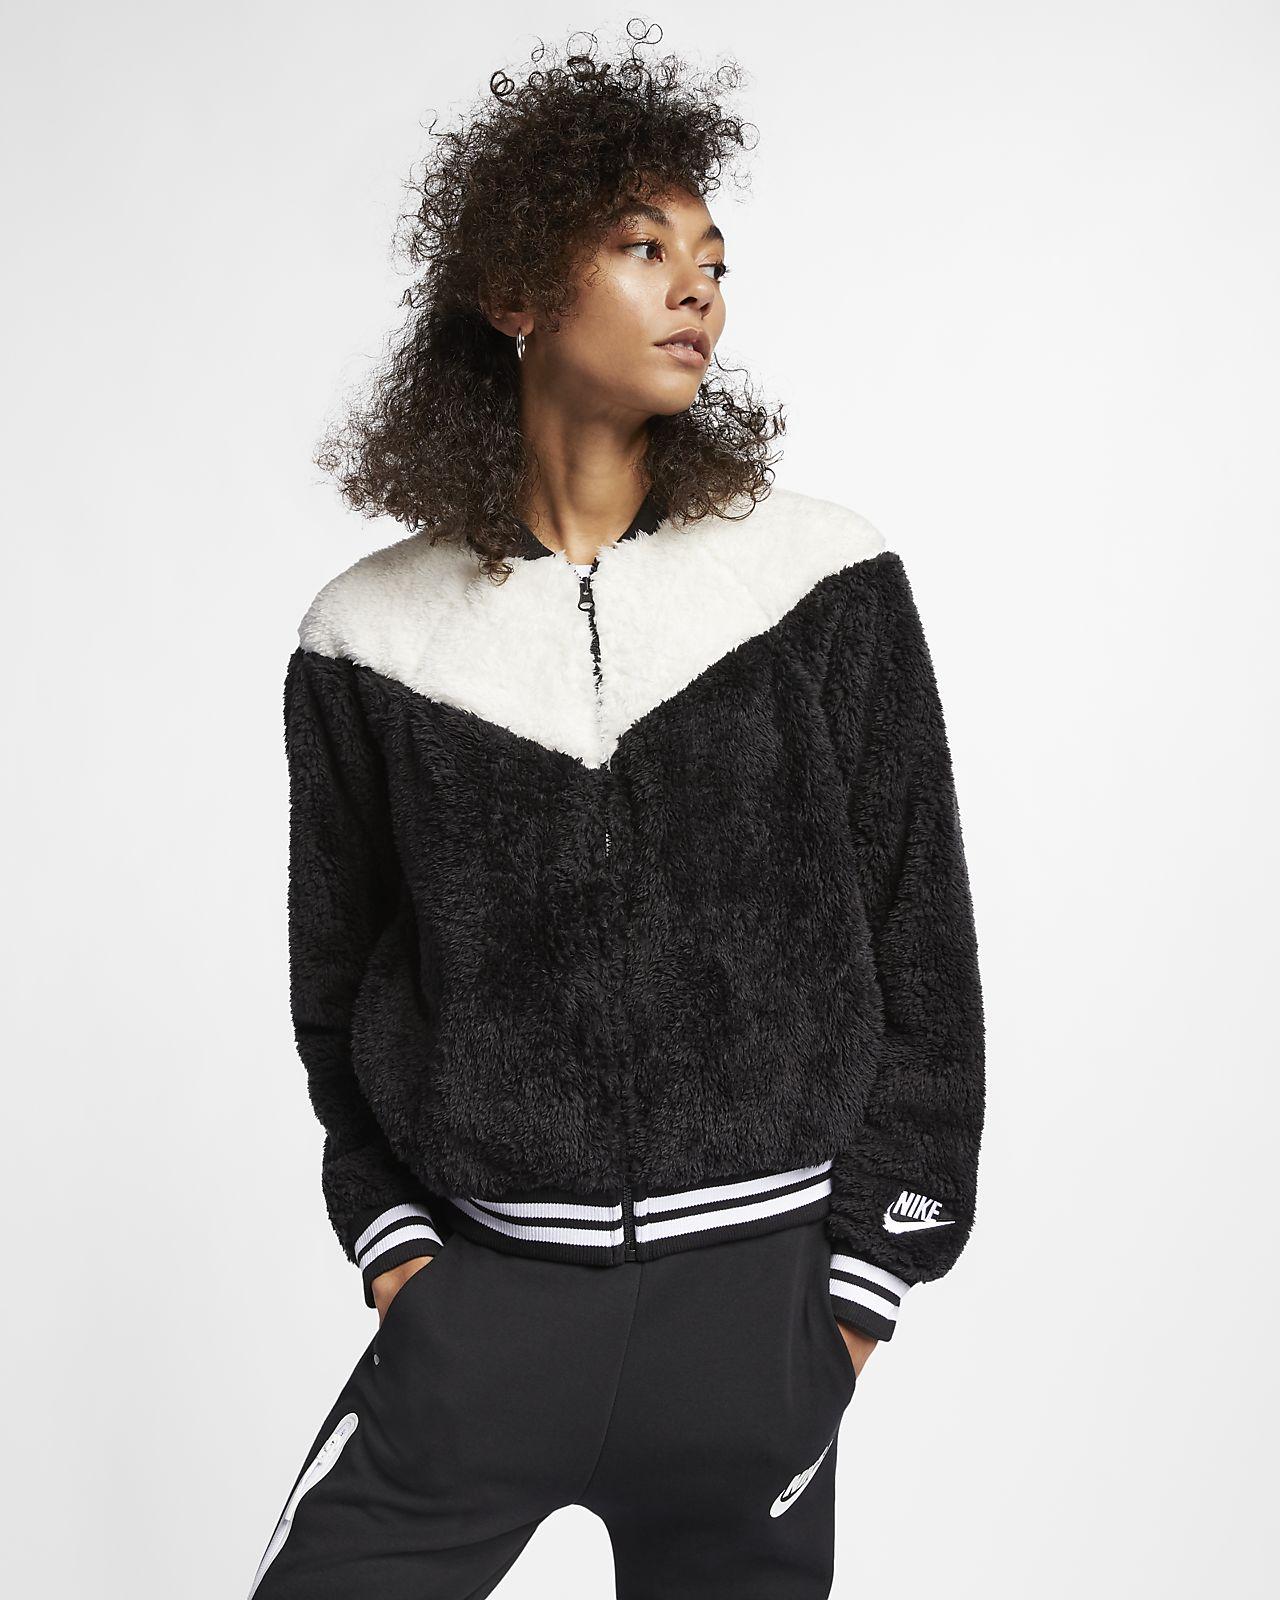 3e5256a0c724 Nike Sportswear Women s Sherpa Bomber Jacket. Nike.com